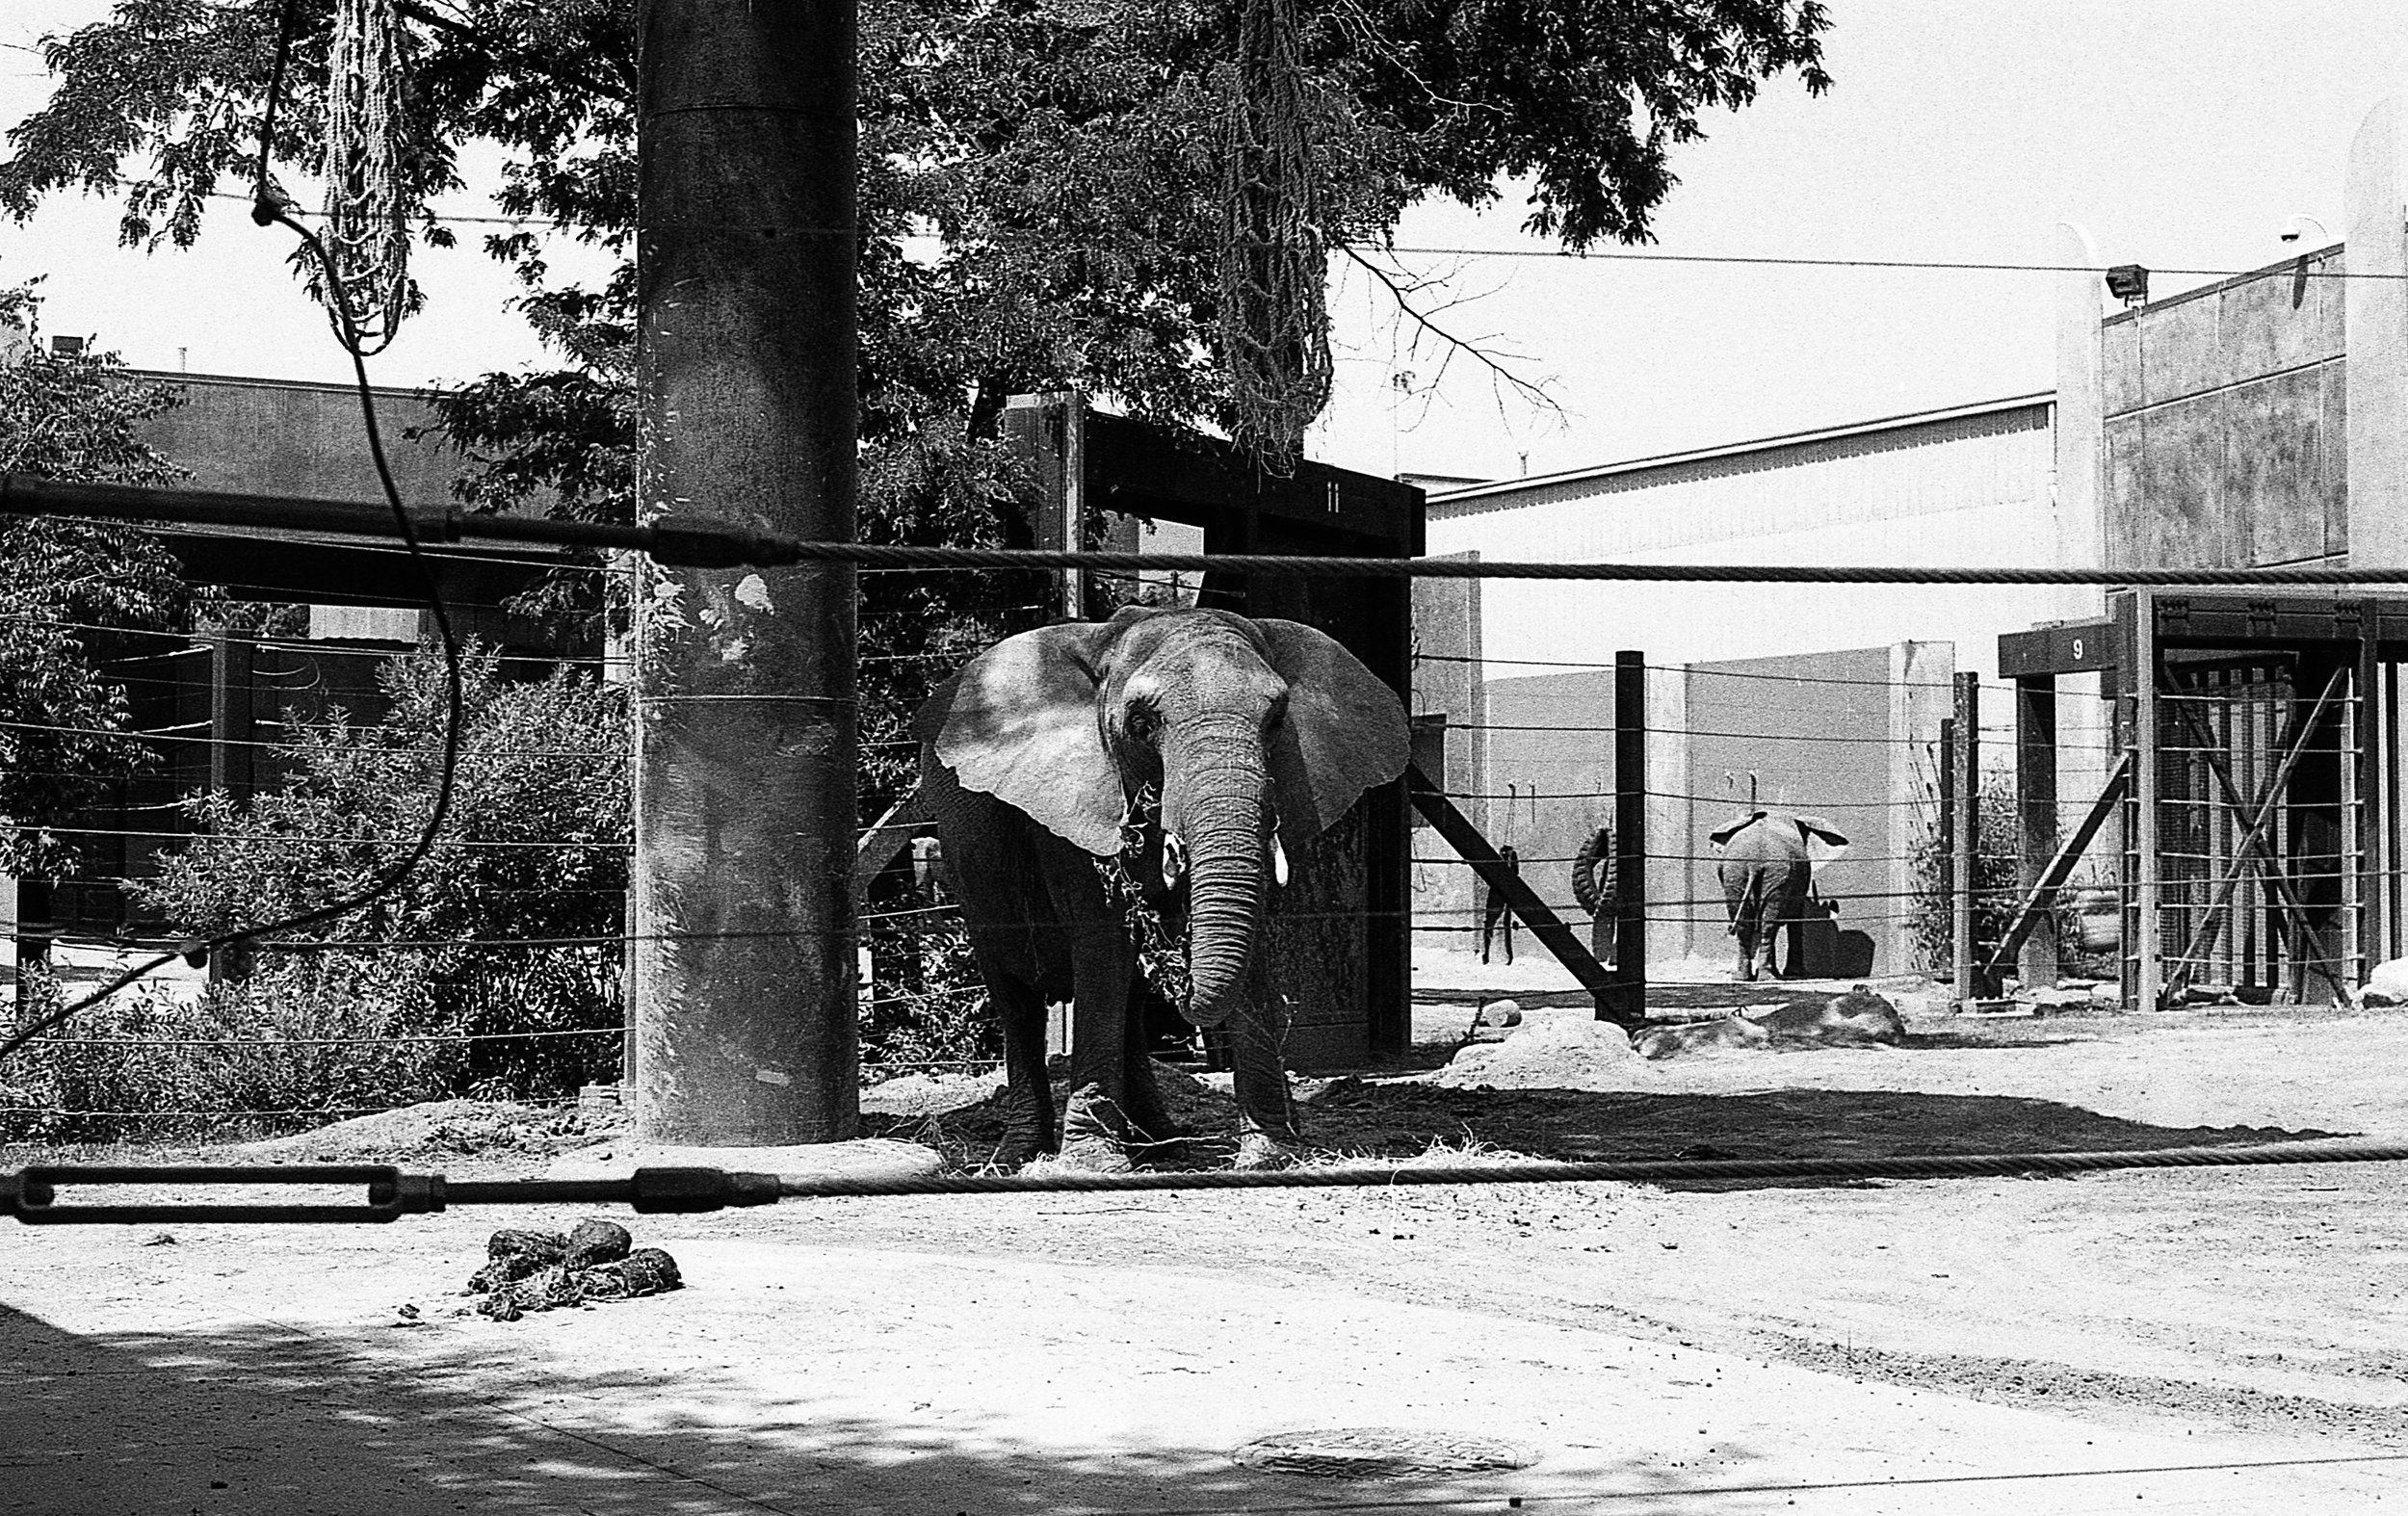 1981 Minolta X-700 Photo 35mm Film Zoe Kissel toledo zoo